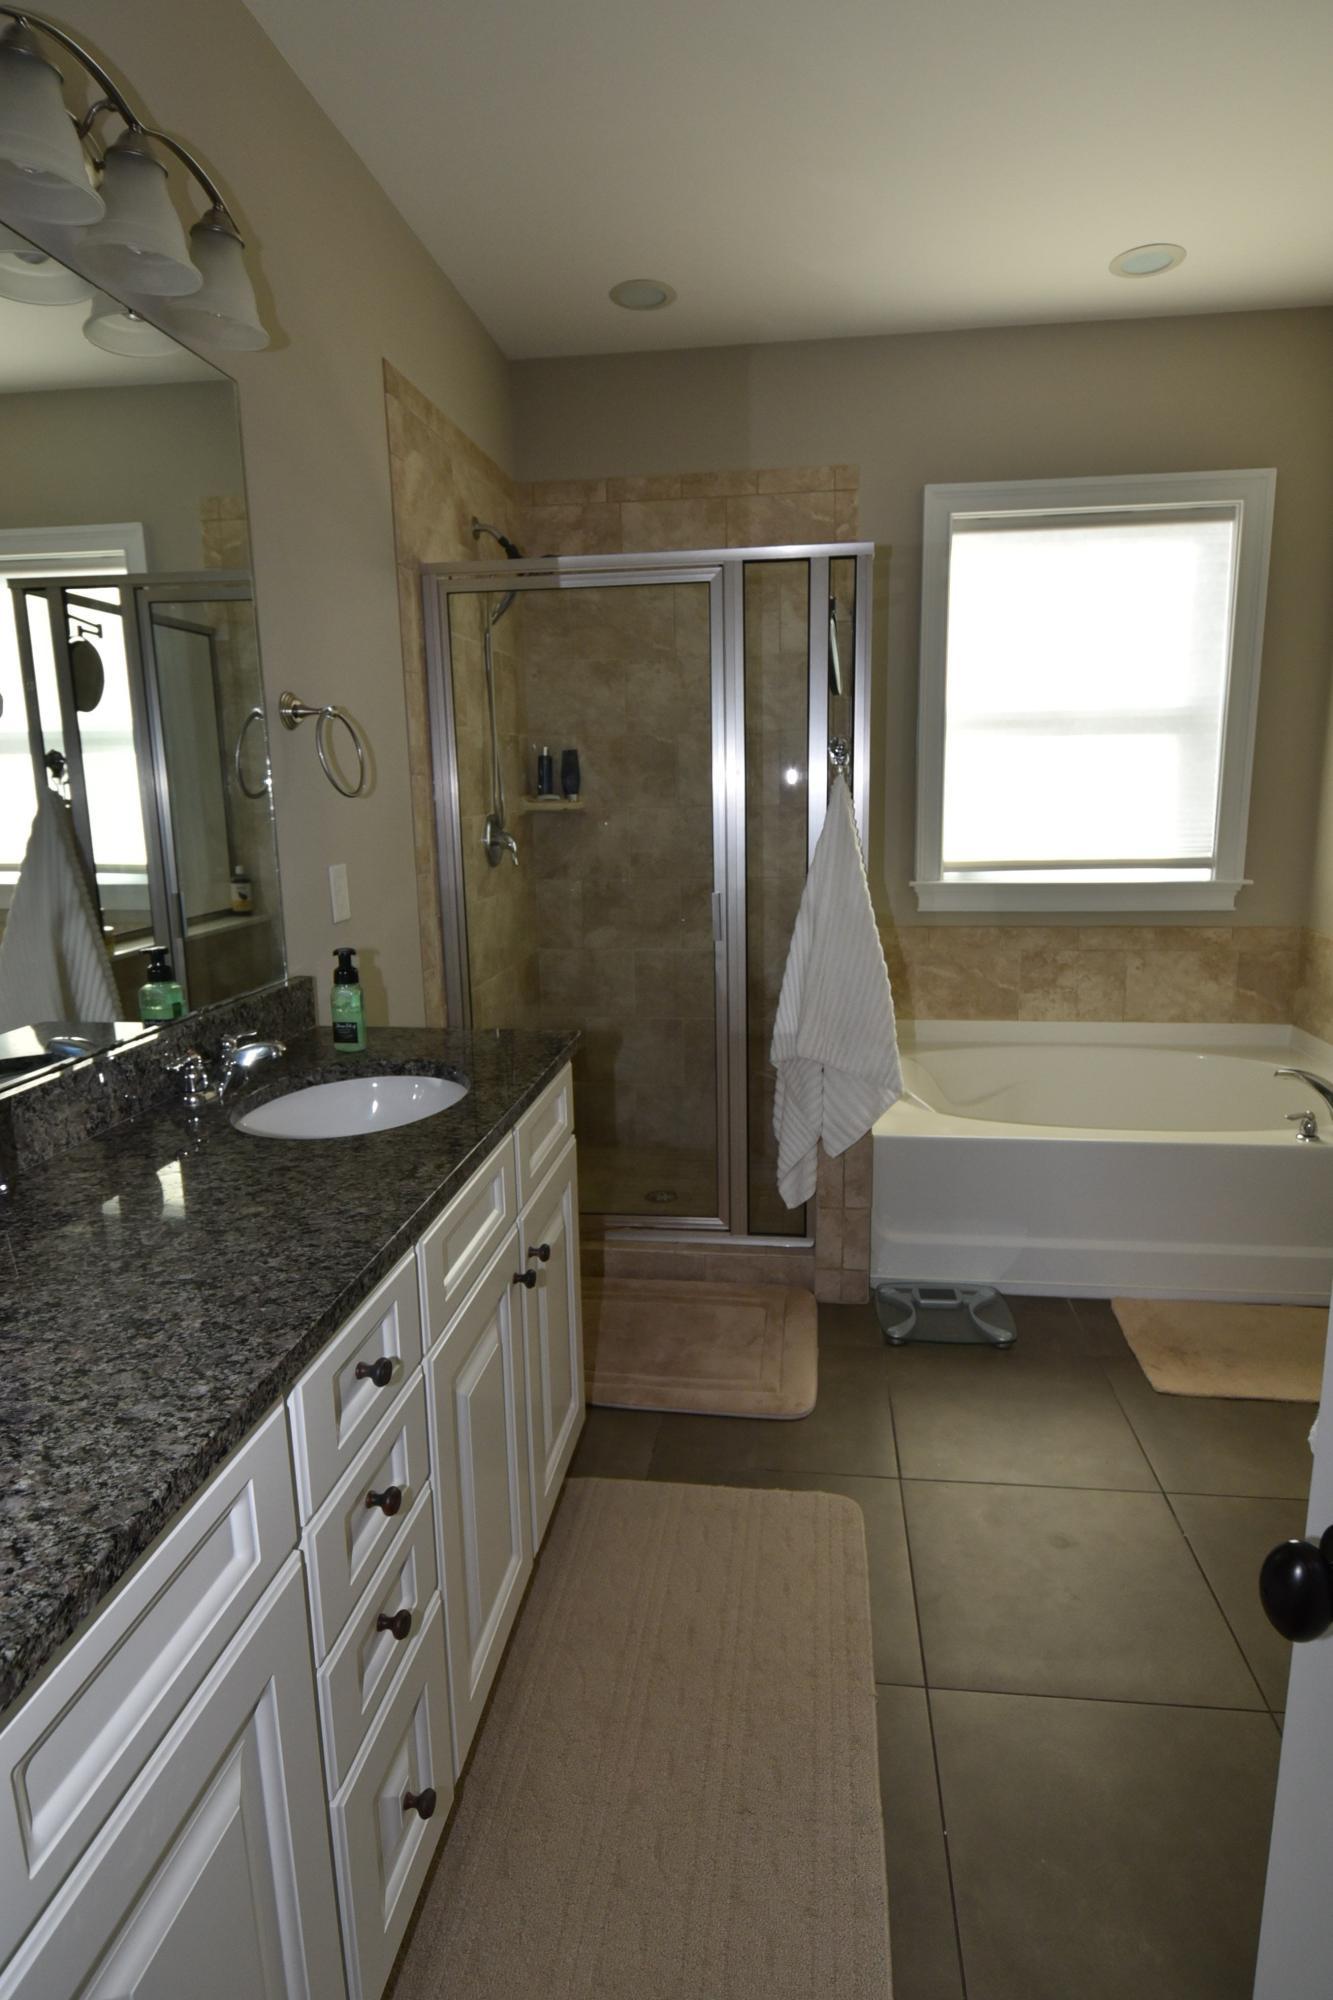 Carolina Park Homes For Sale - 1451 Crane Creek, Mount Pleasant, SC - 0